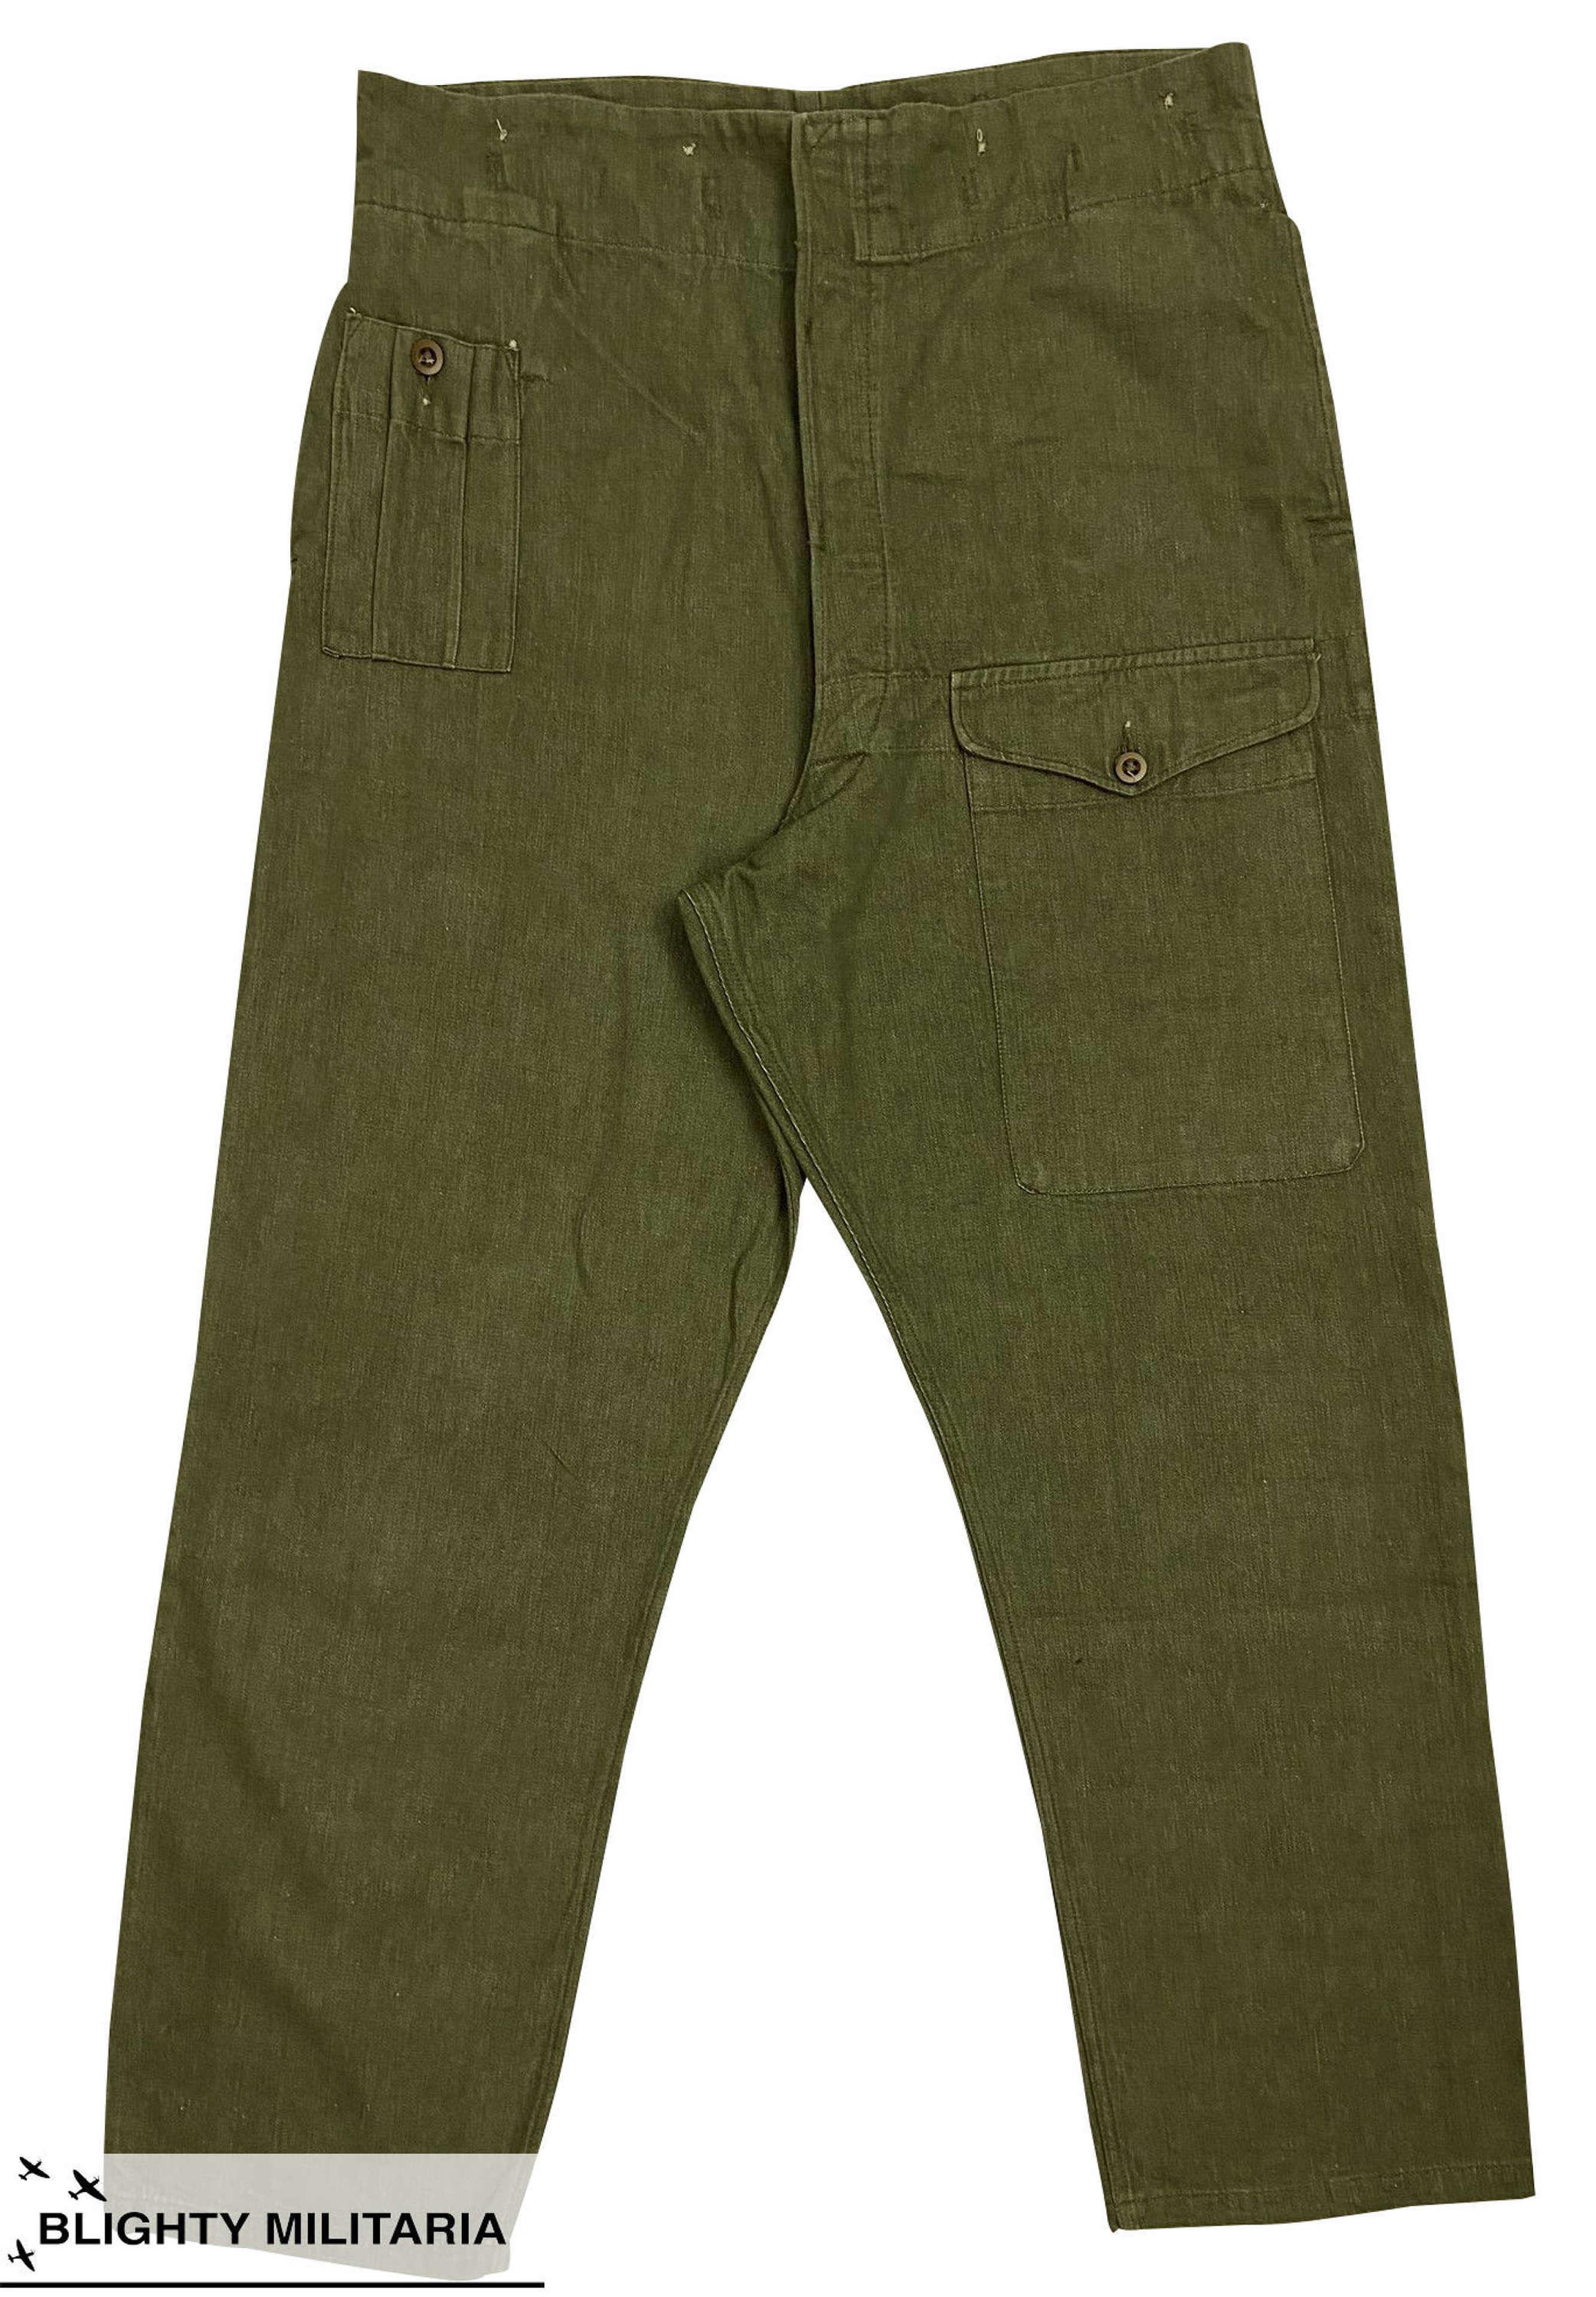 Original 1953 Dated British Denim Battledress Trousers - Size 10